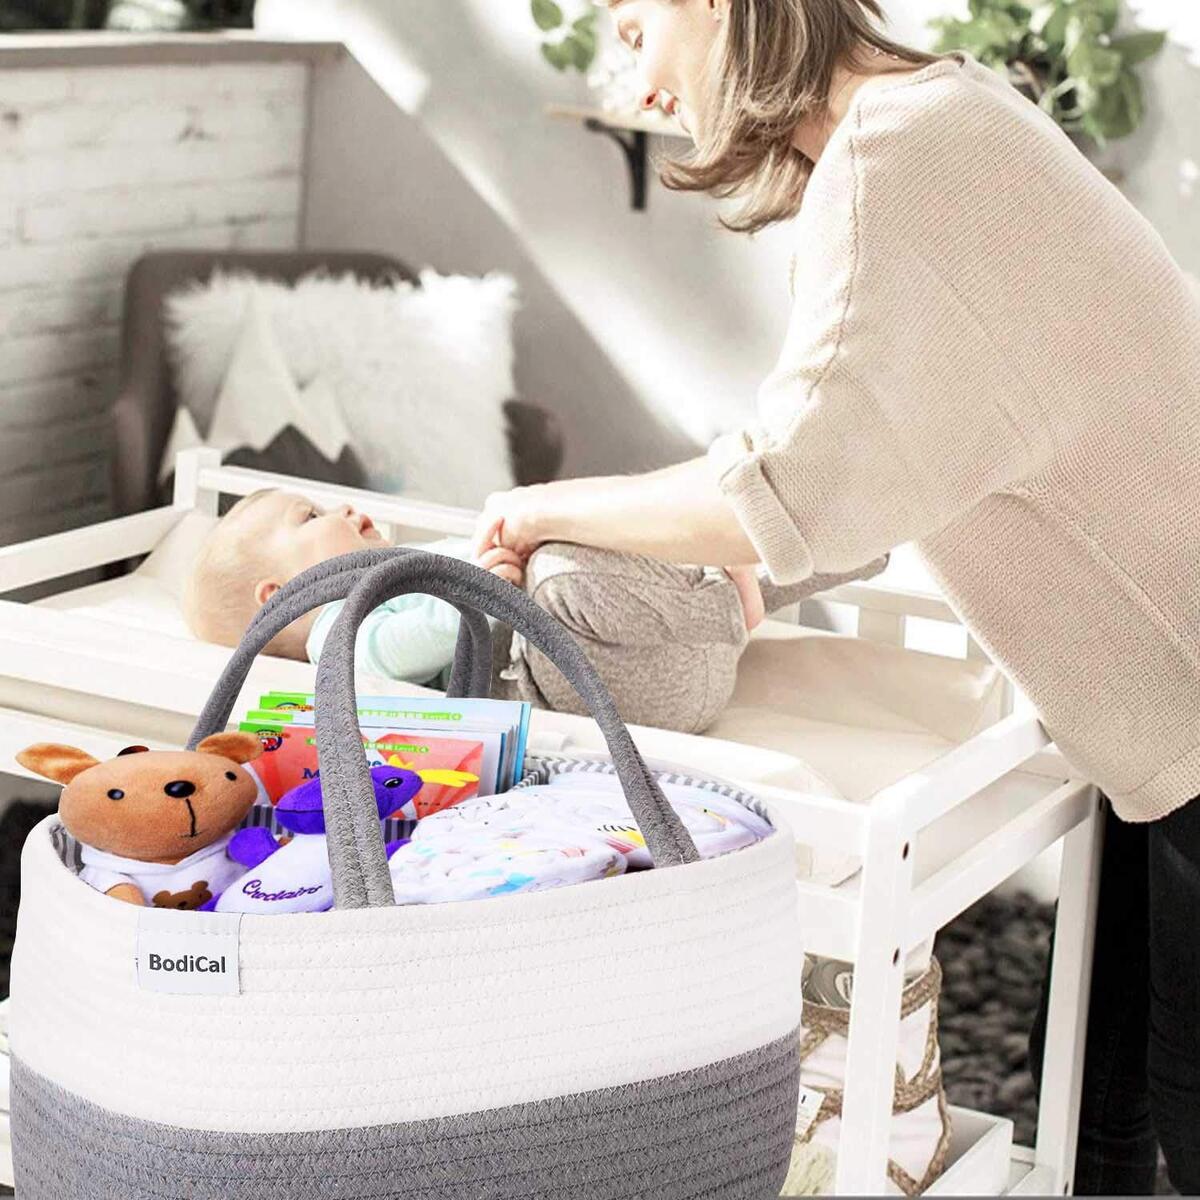 Baby Diaper Caddy Organizer - 100% Cotton Rope Nursery Diaper Storage Basket Diaper Storage Bin for Diaper Wipes Toys Nursery Essentials Baby Shower Gift and Newborn Registry (14.2